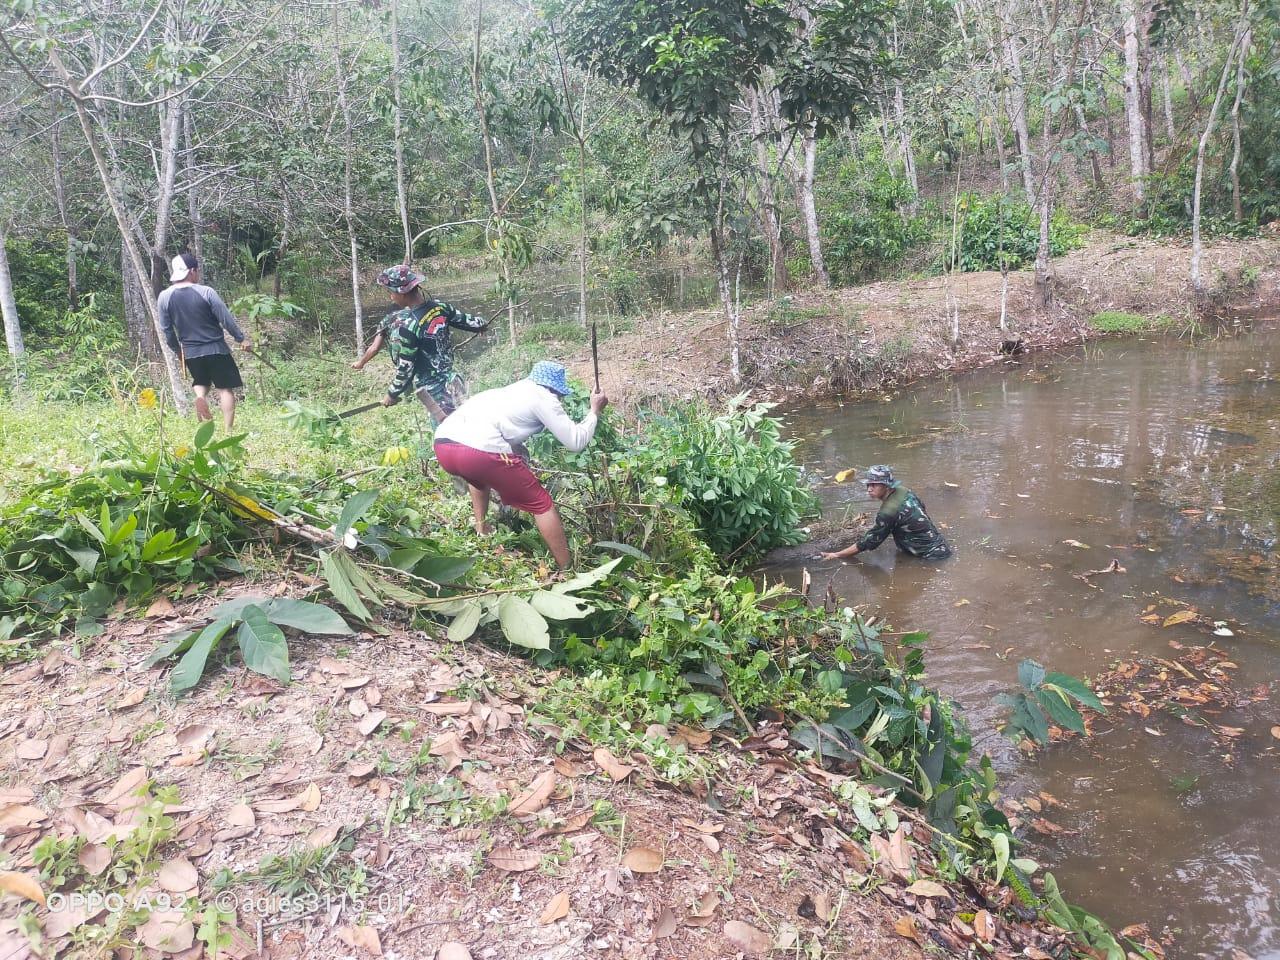 Tarmiji Senang, Satgas TMMD 110 Kodim 1008/Tanjung Bersihkan Kolam Ikannya